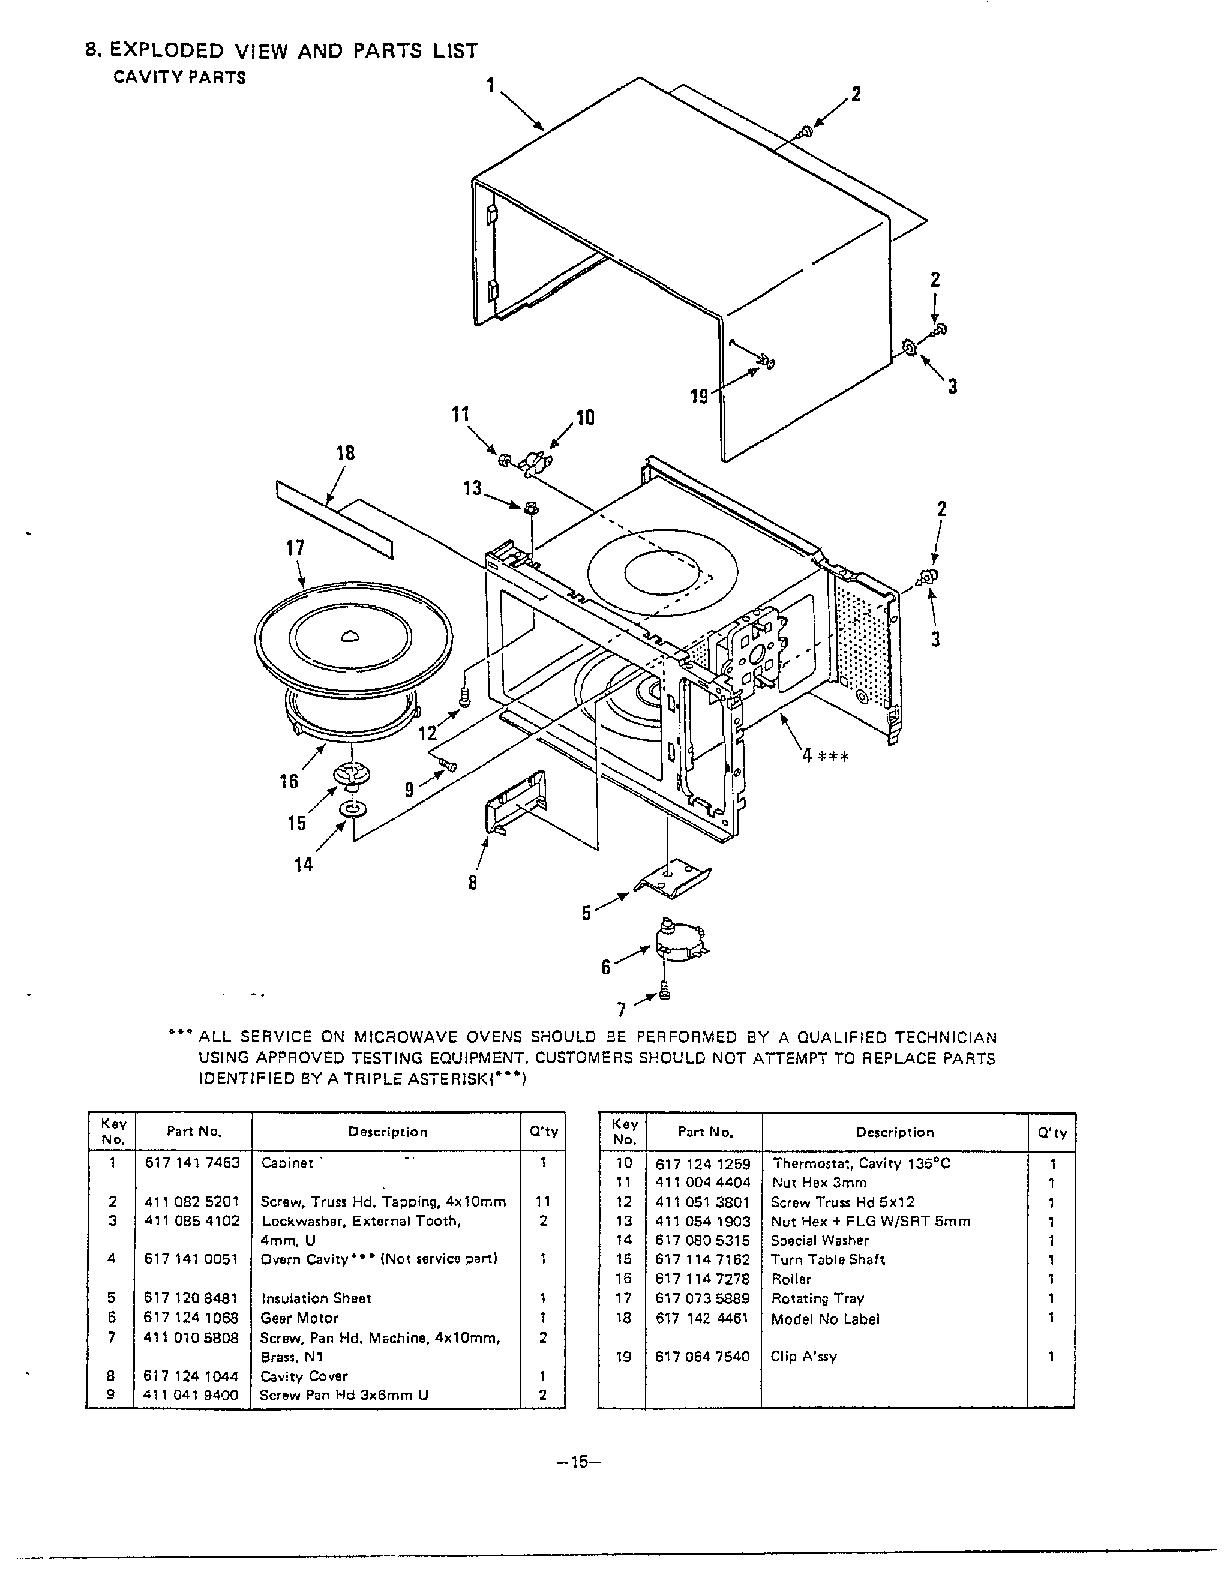 Sanyo model EM604TWS countertop microwave genuine parts